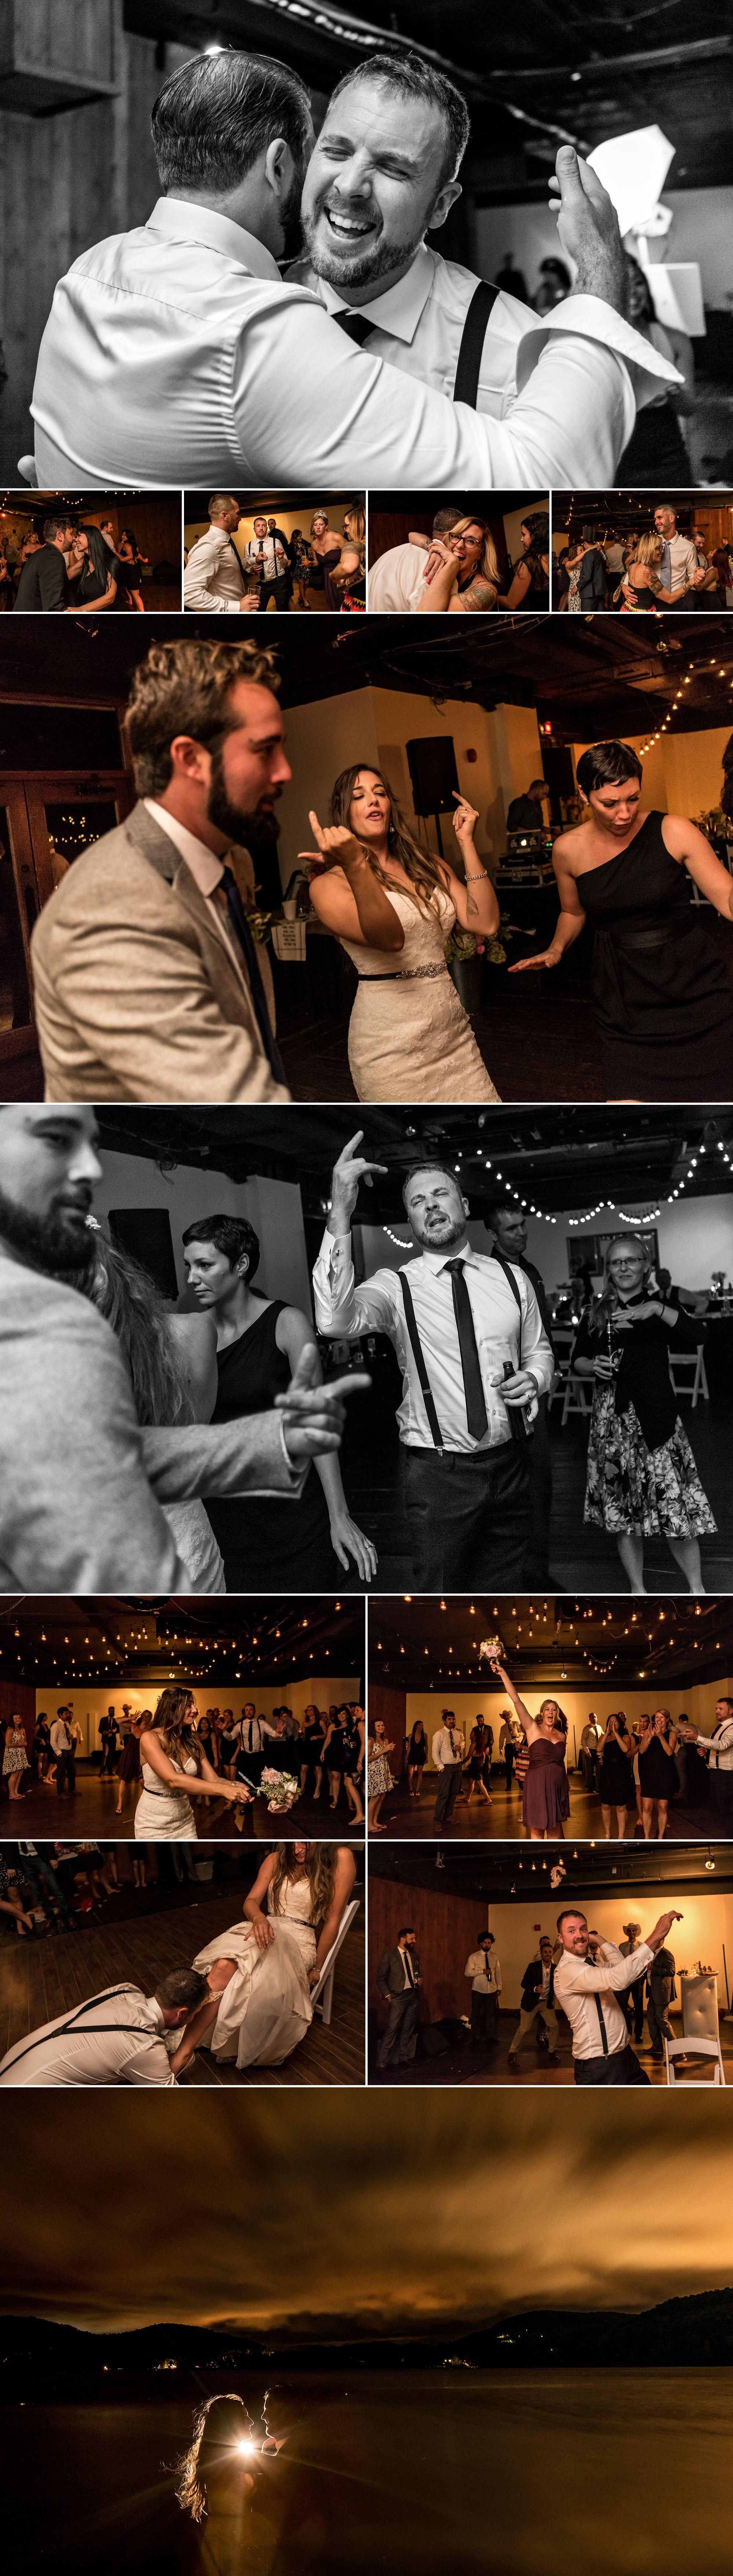 Wedding reception at le grand lodge, mont tremblant